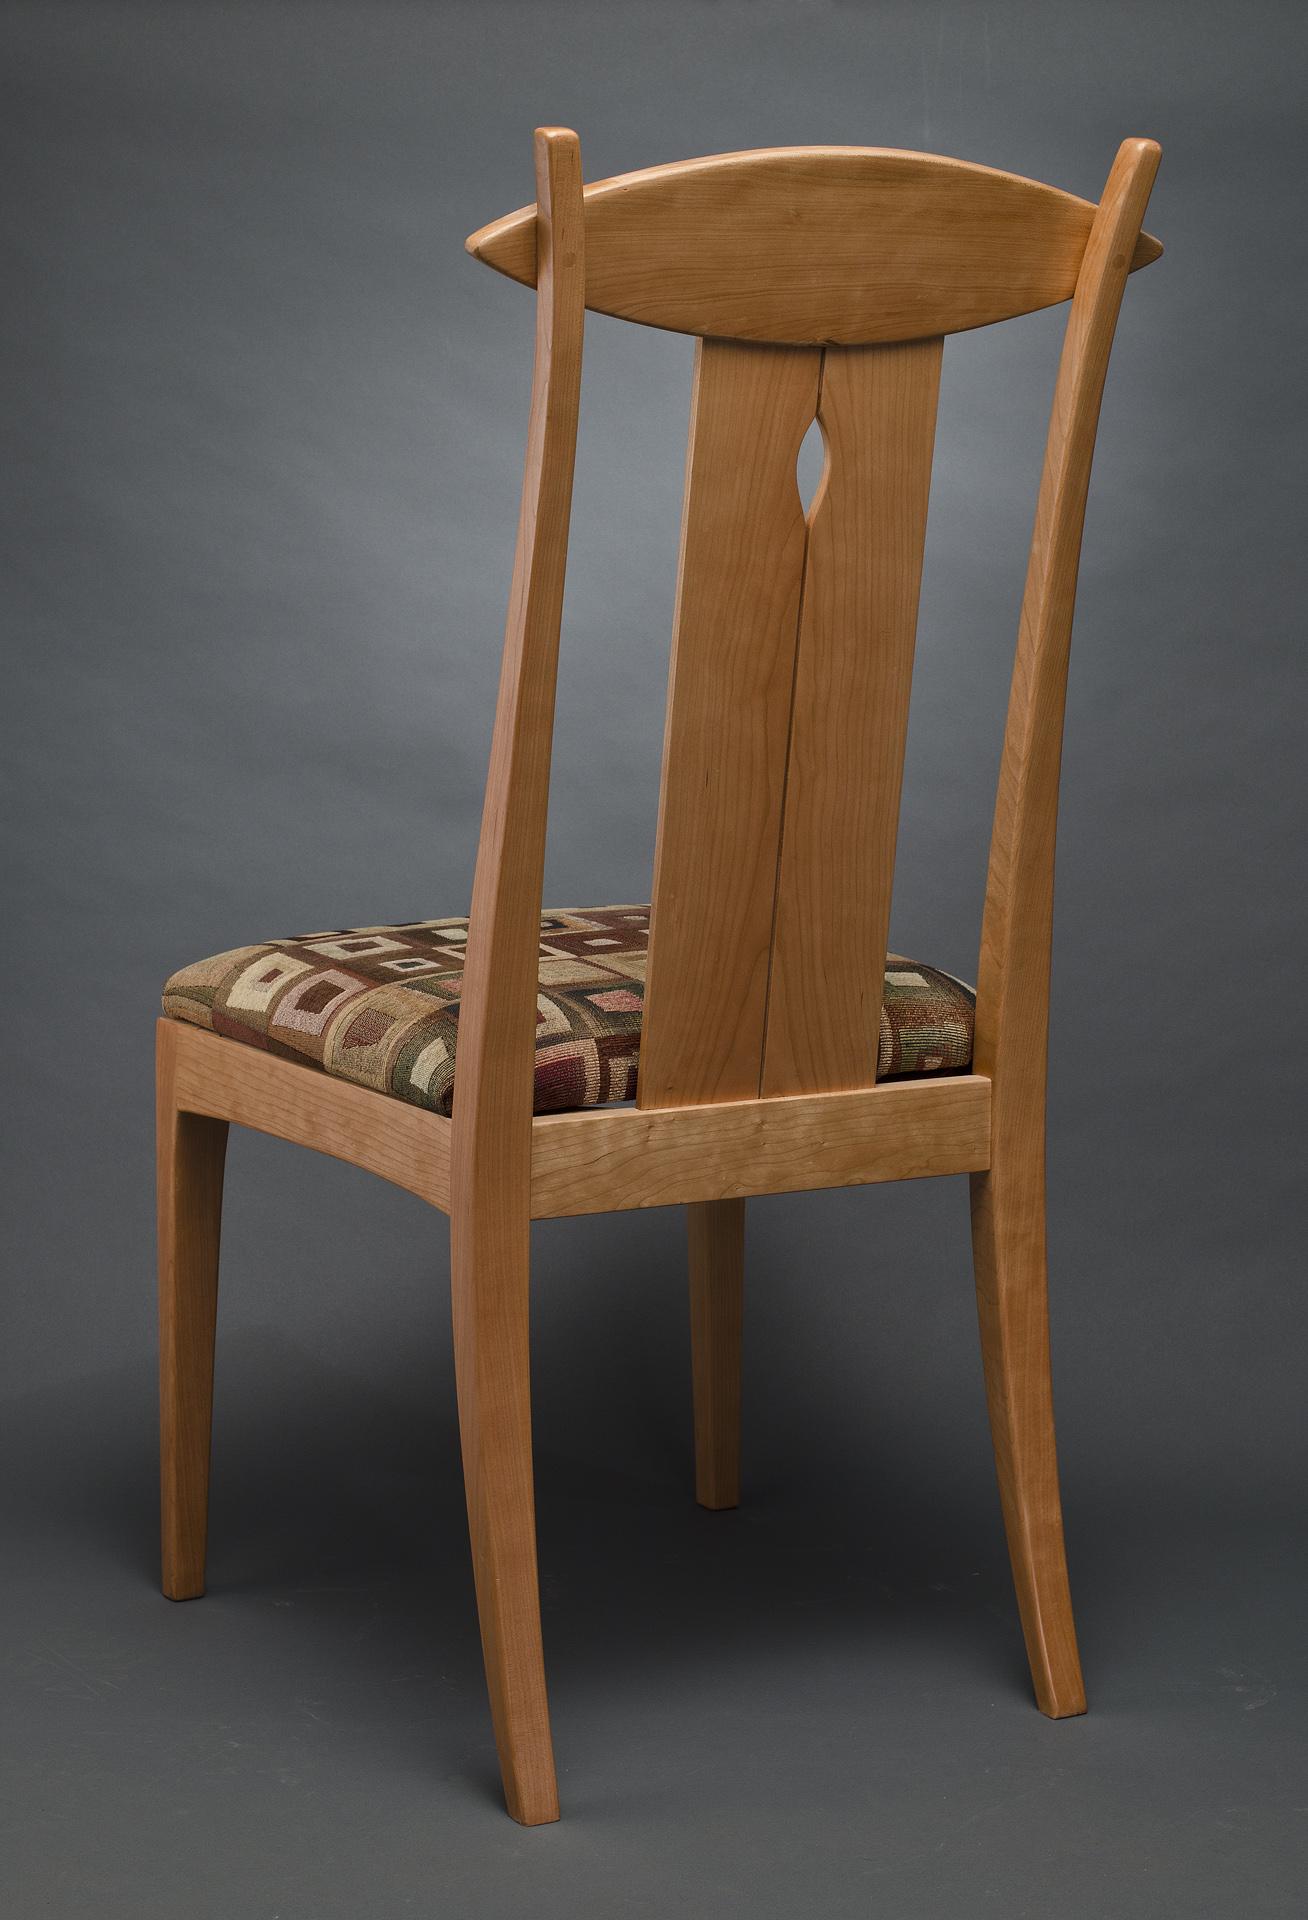 Lyra chair